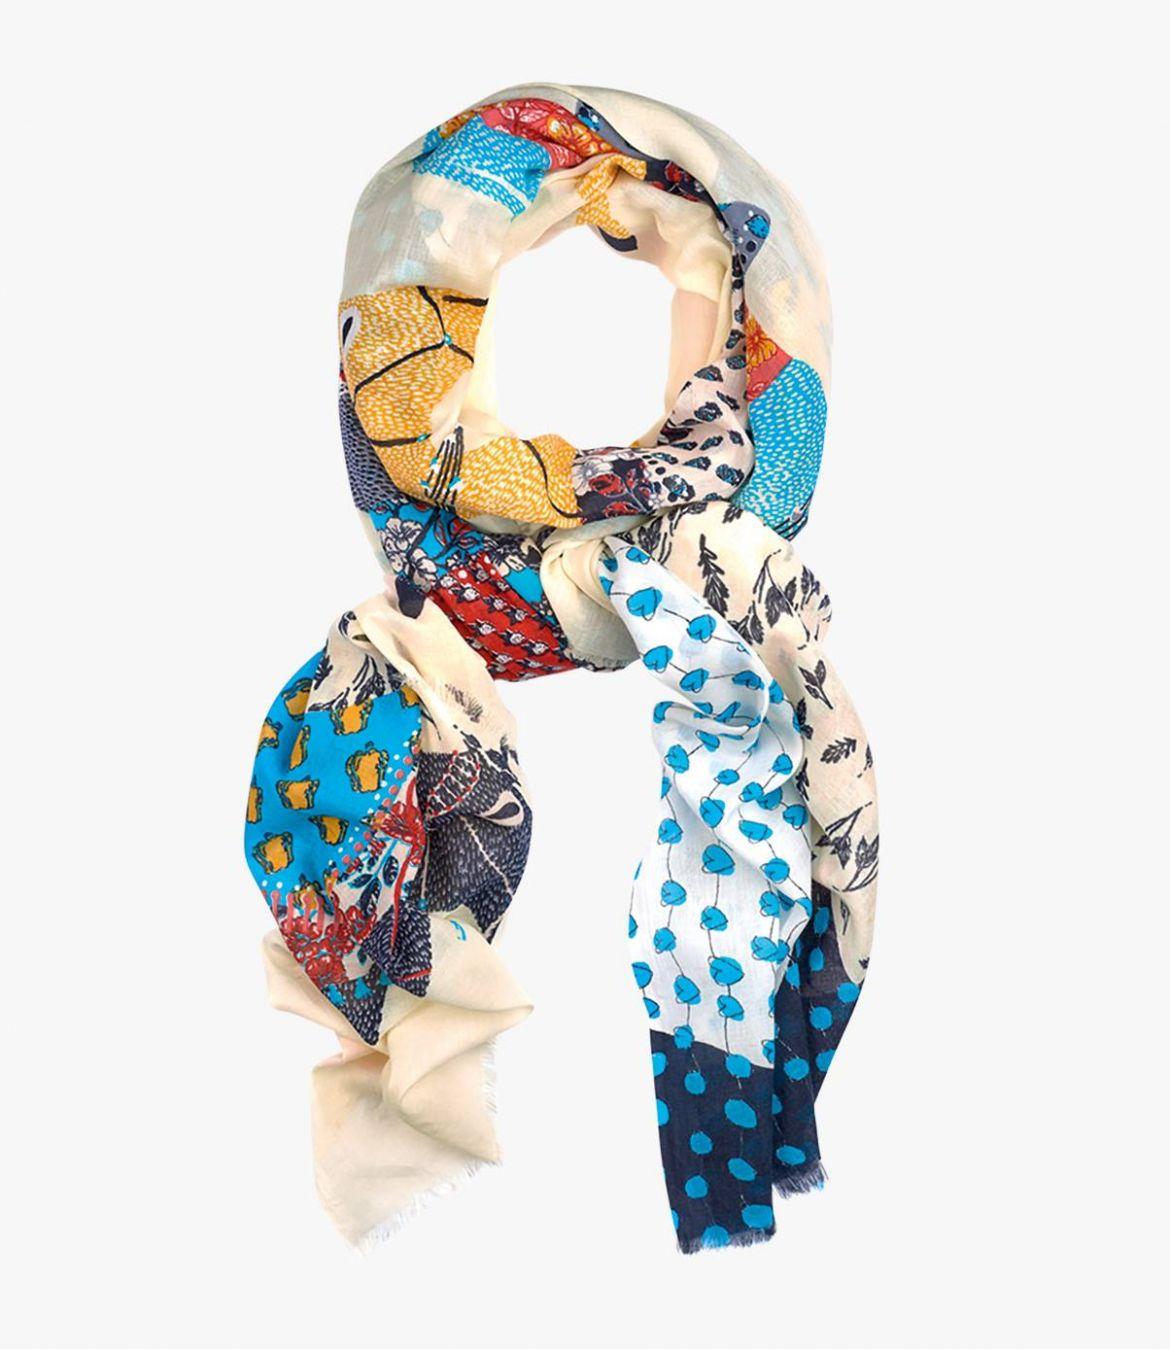 ABBY Women's Cotton Scarf 100x200 cm Storiatipic - 4